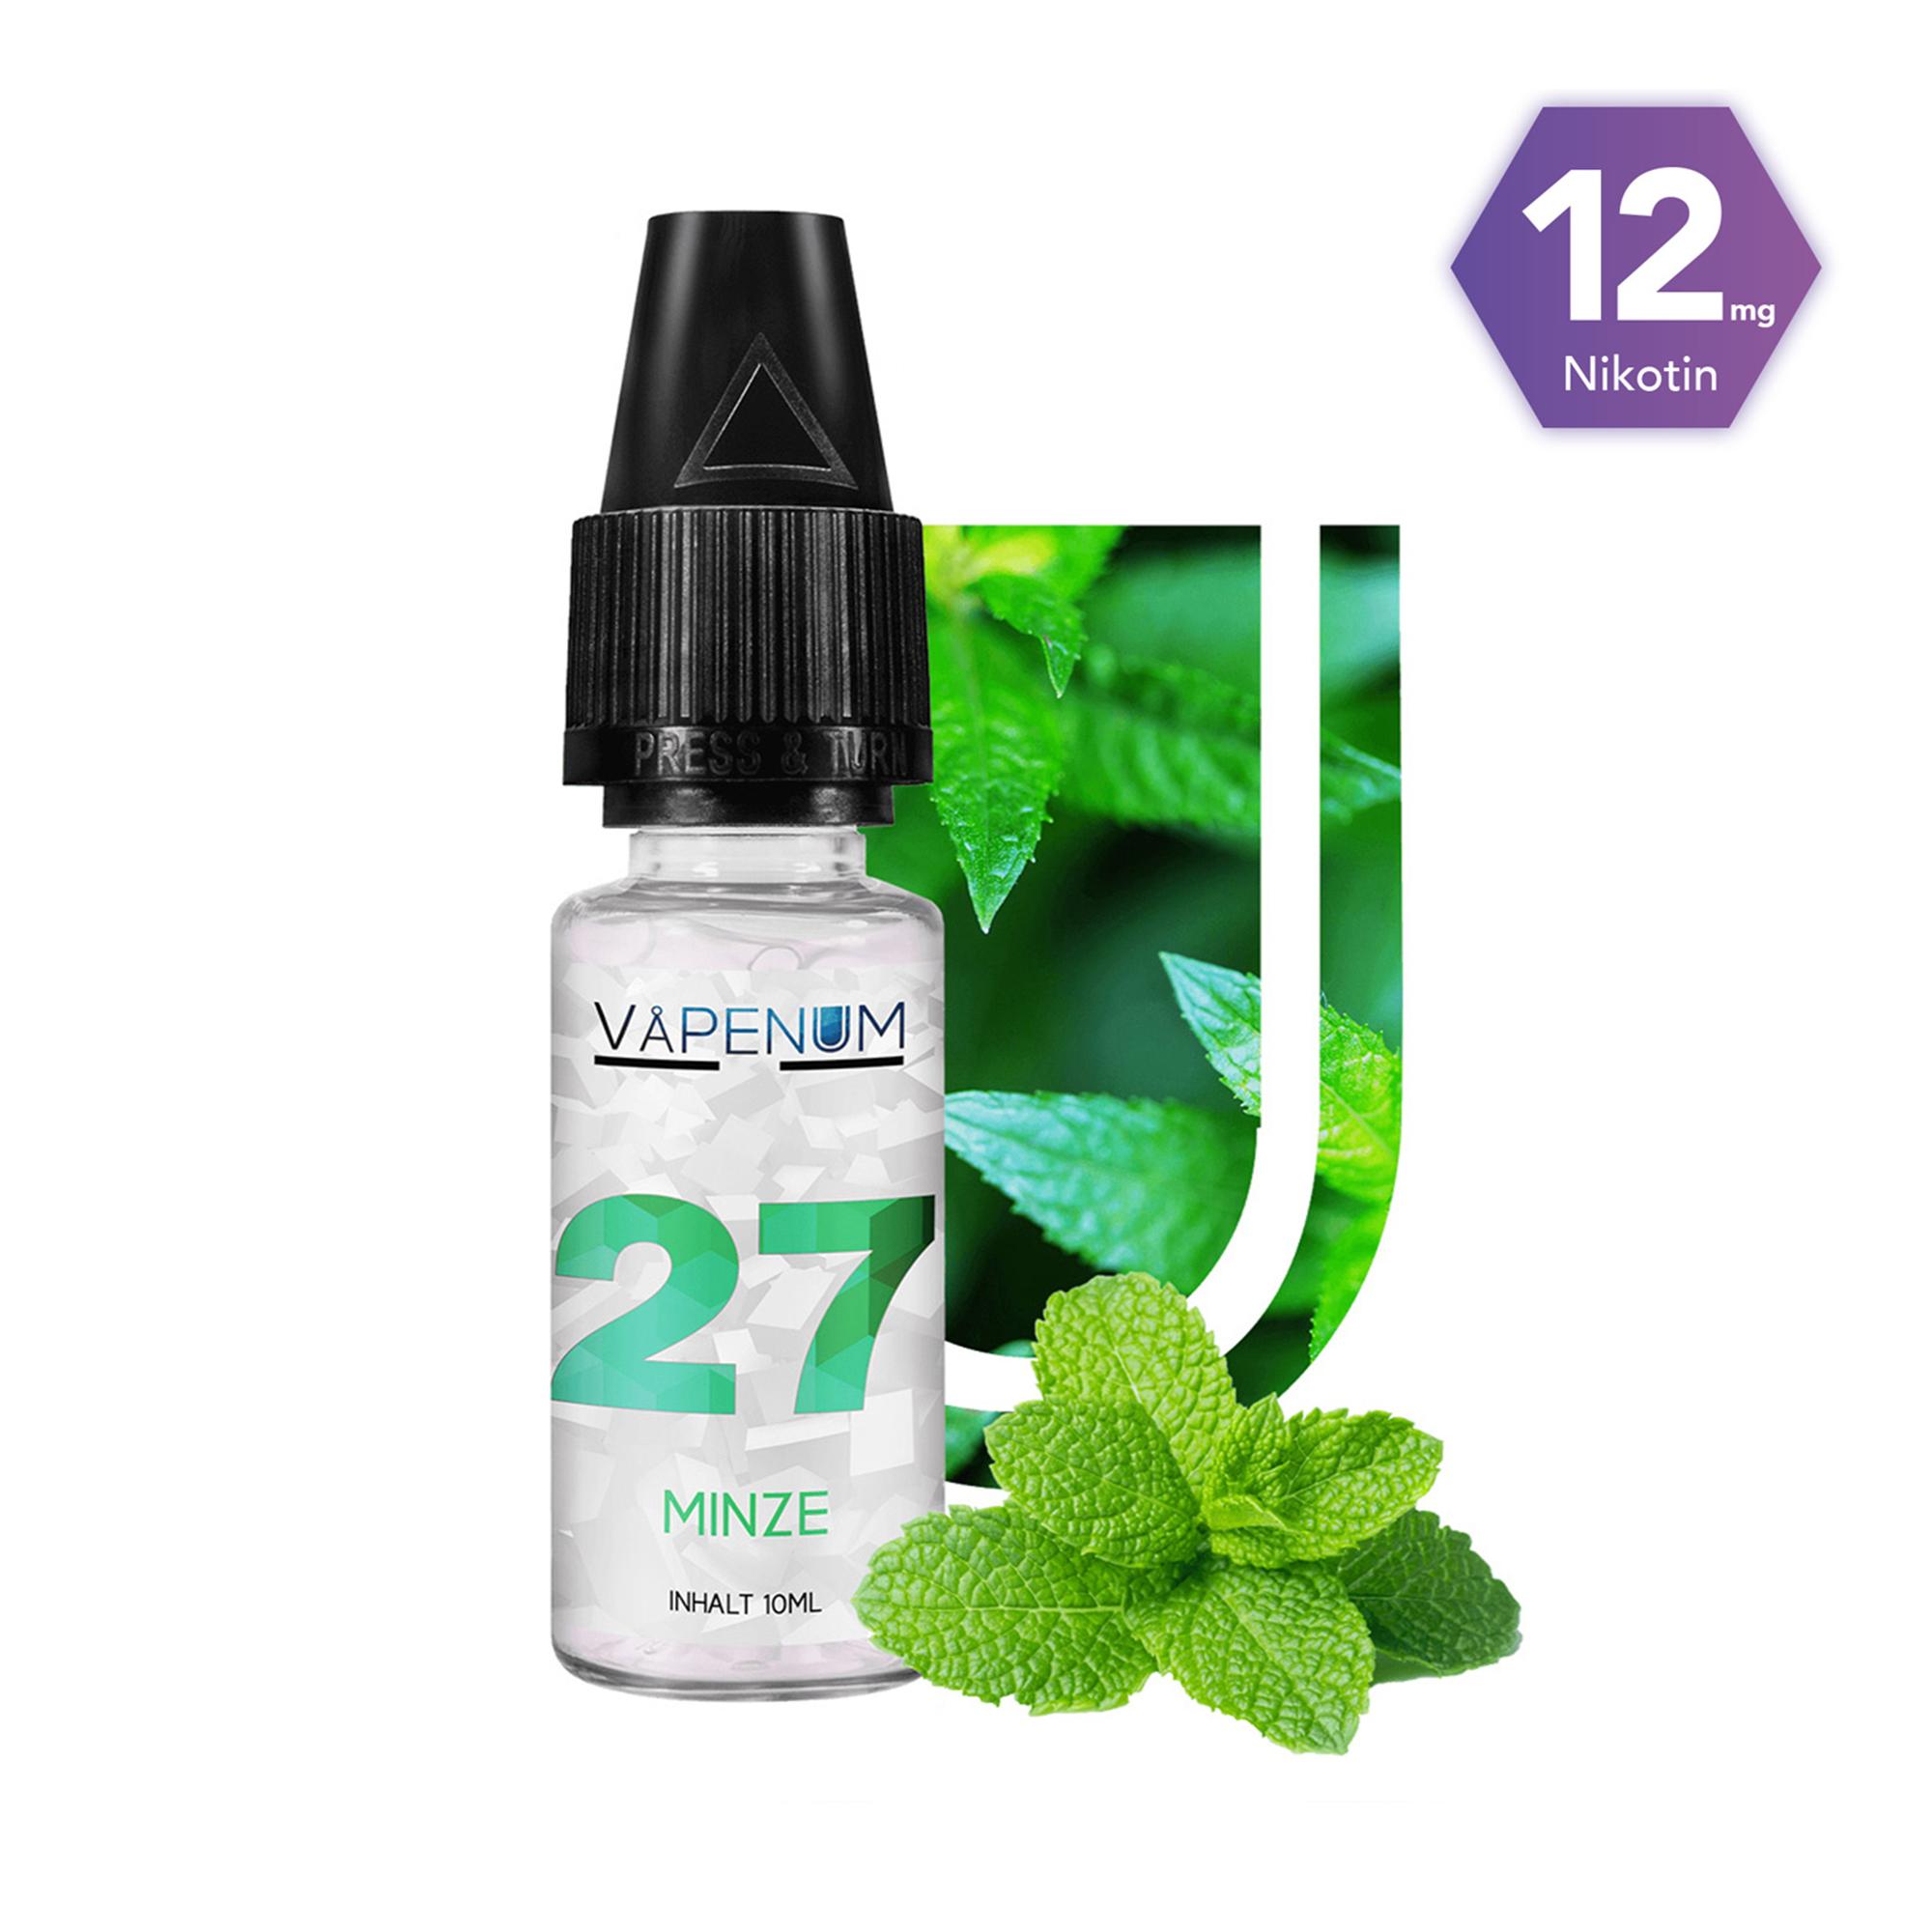 27 - Minze Liquid by Vapenum 12mg